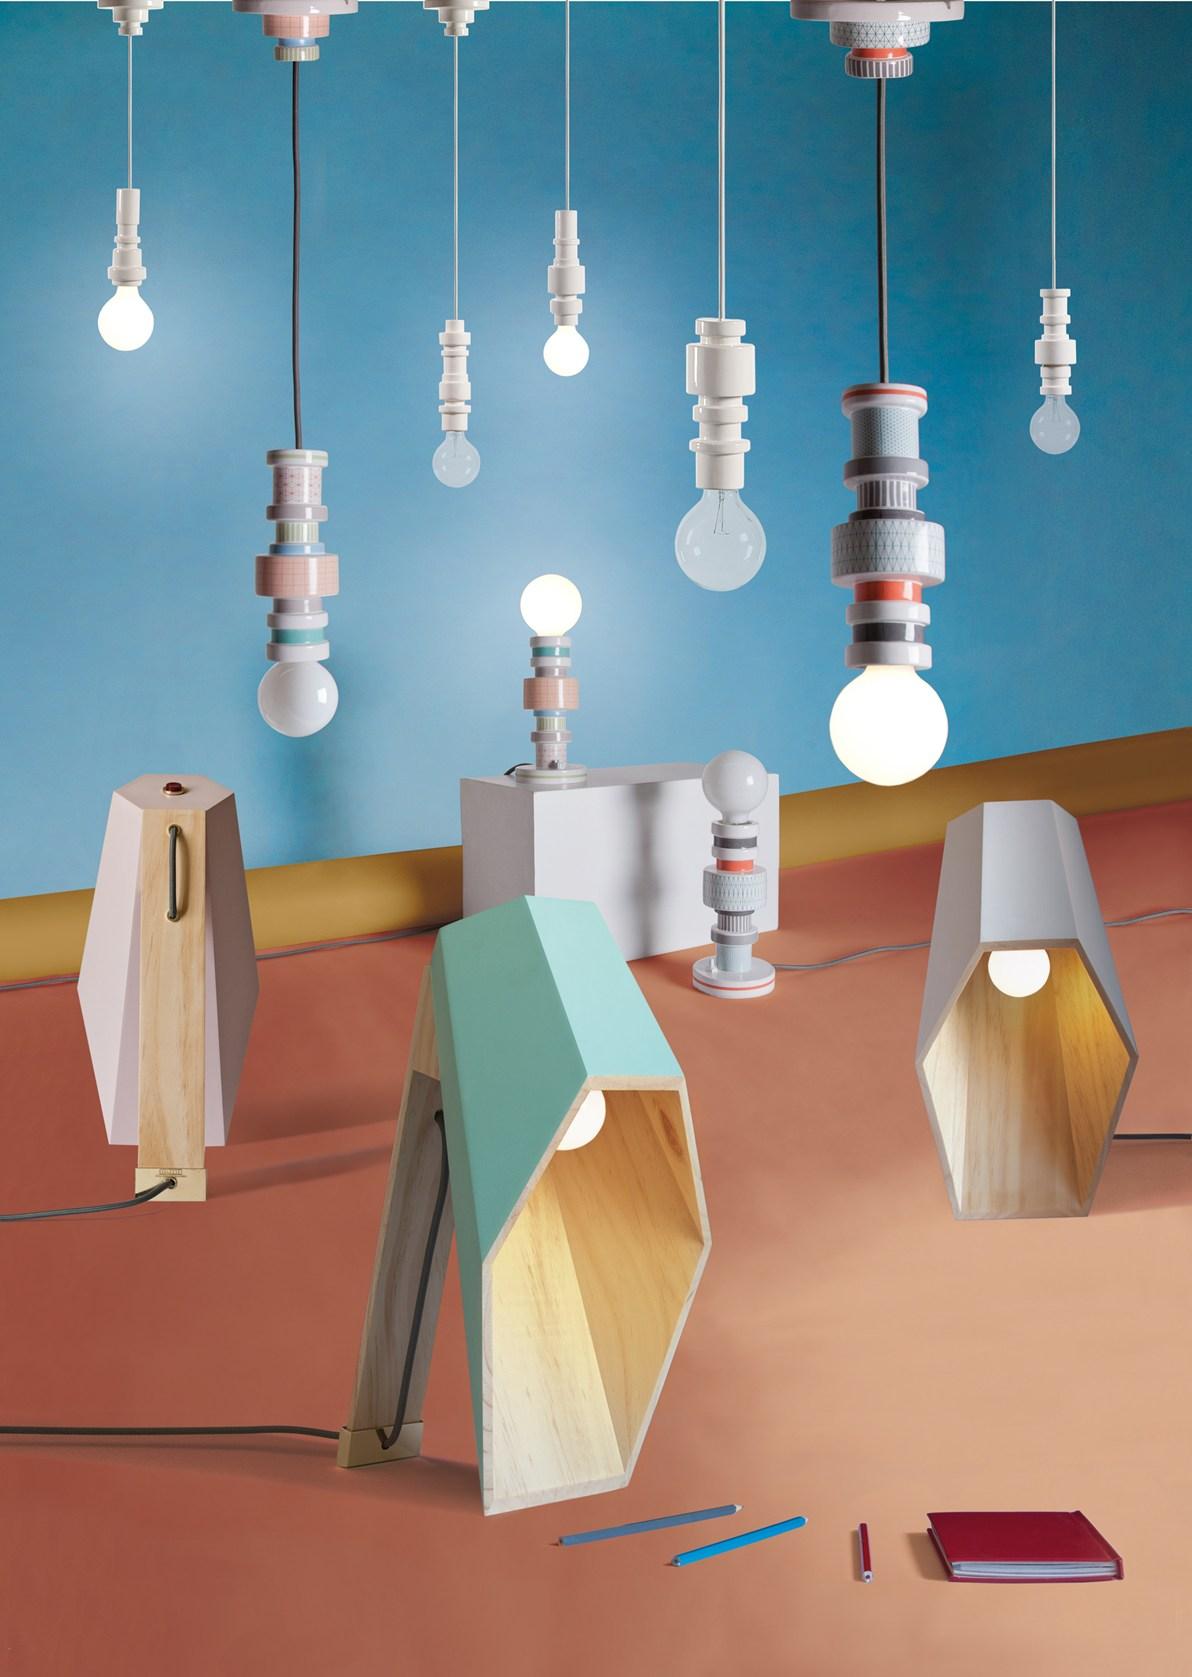 Moresque Lamps by Alessandro Zambelli for Seletti